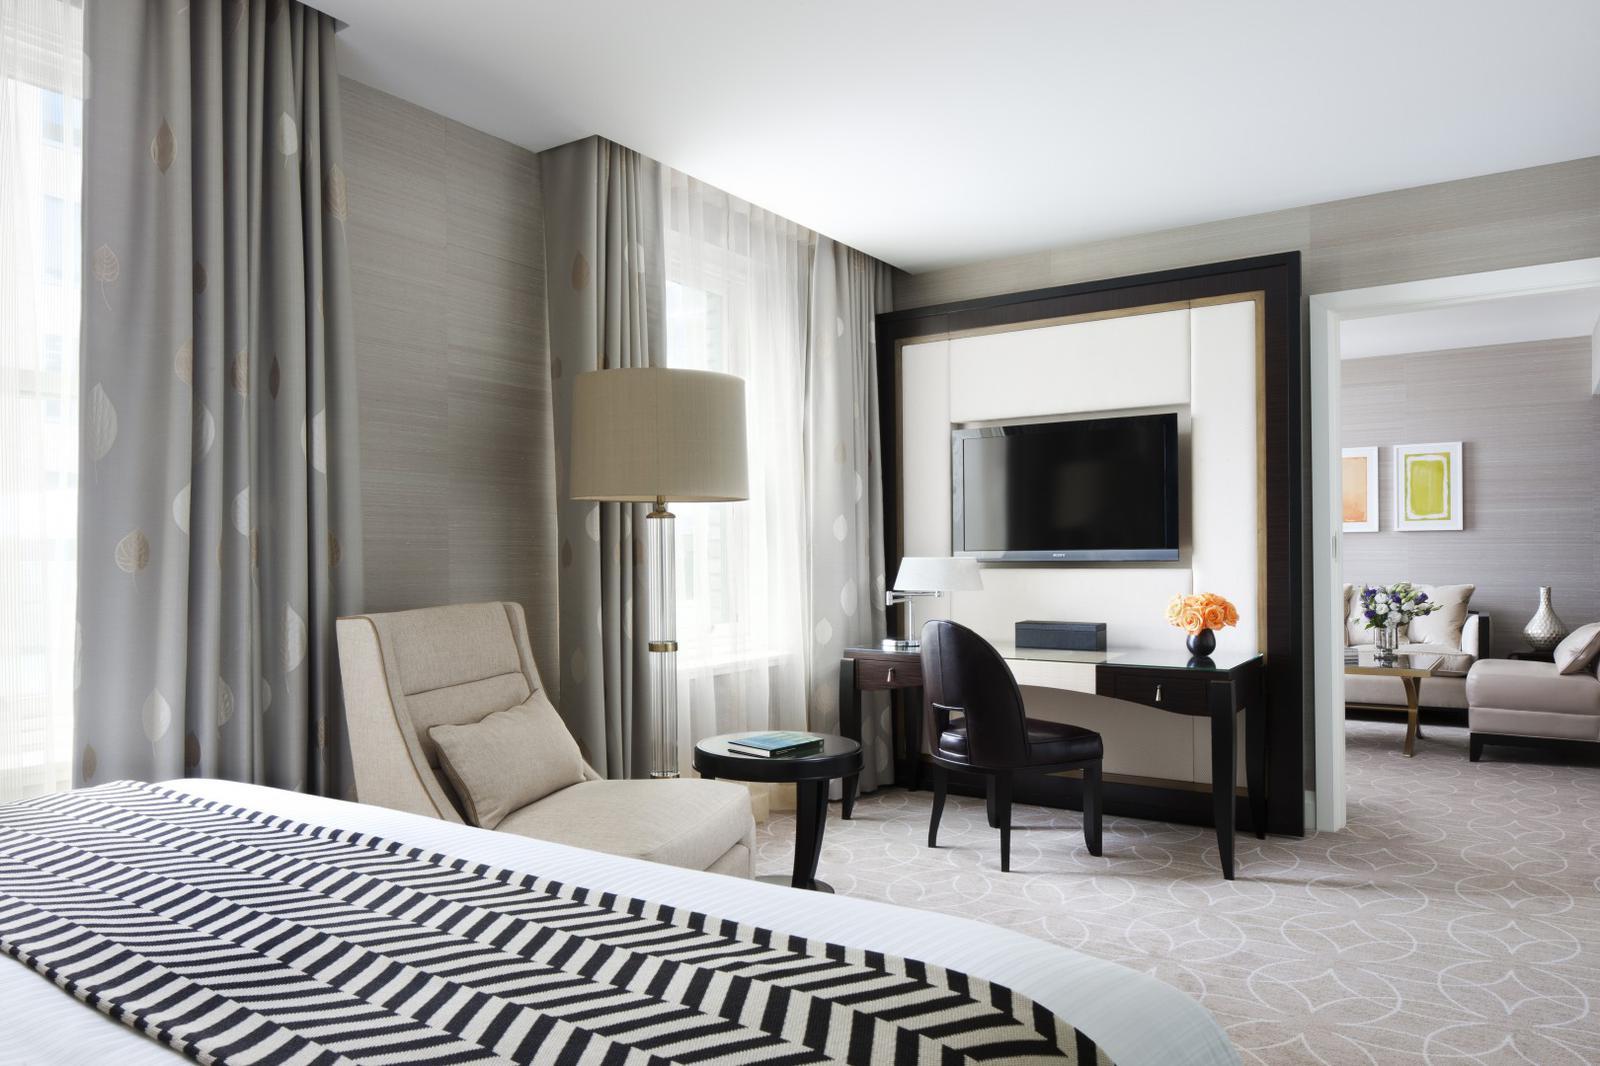 Celebrity hotels Vancouver